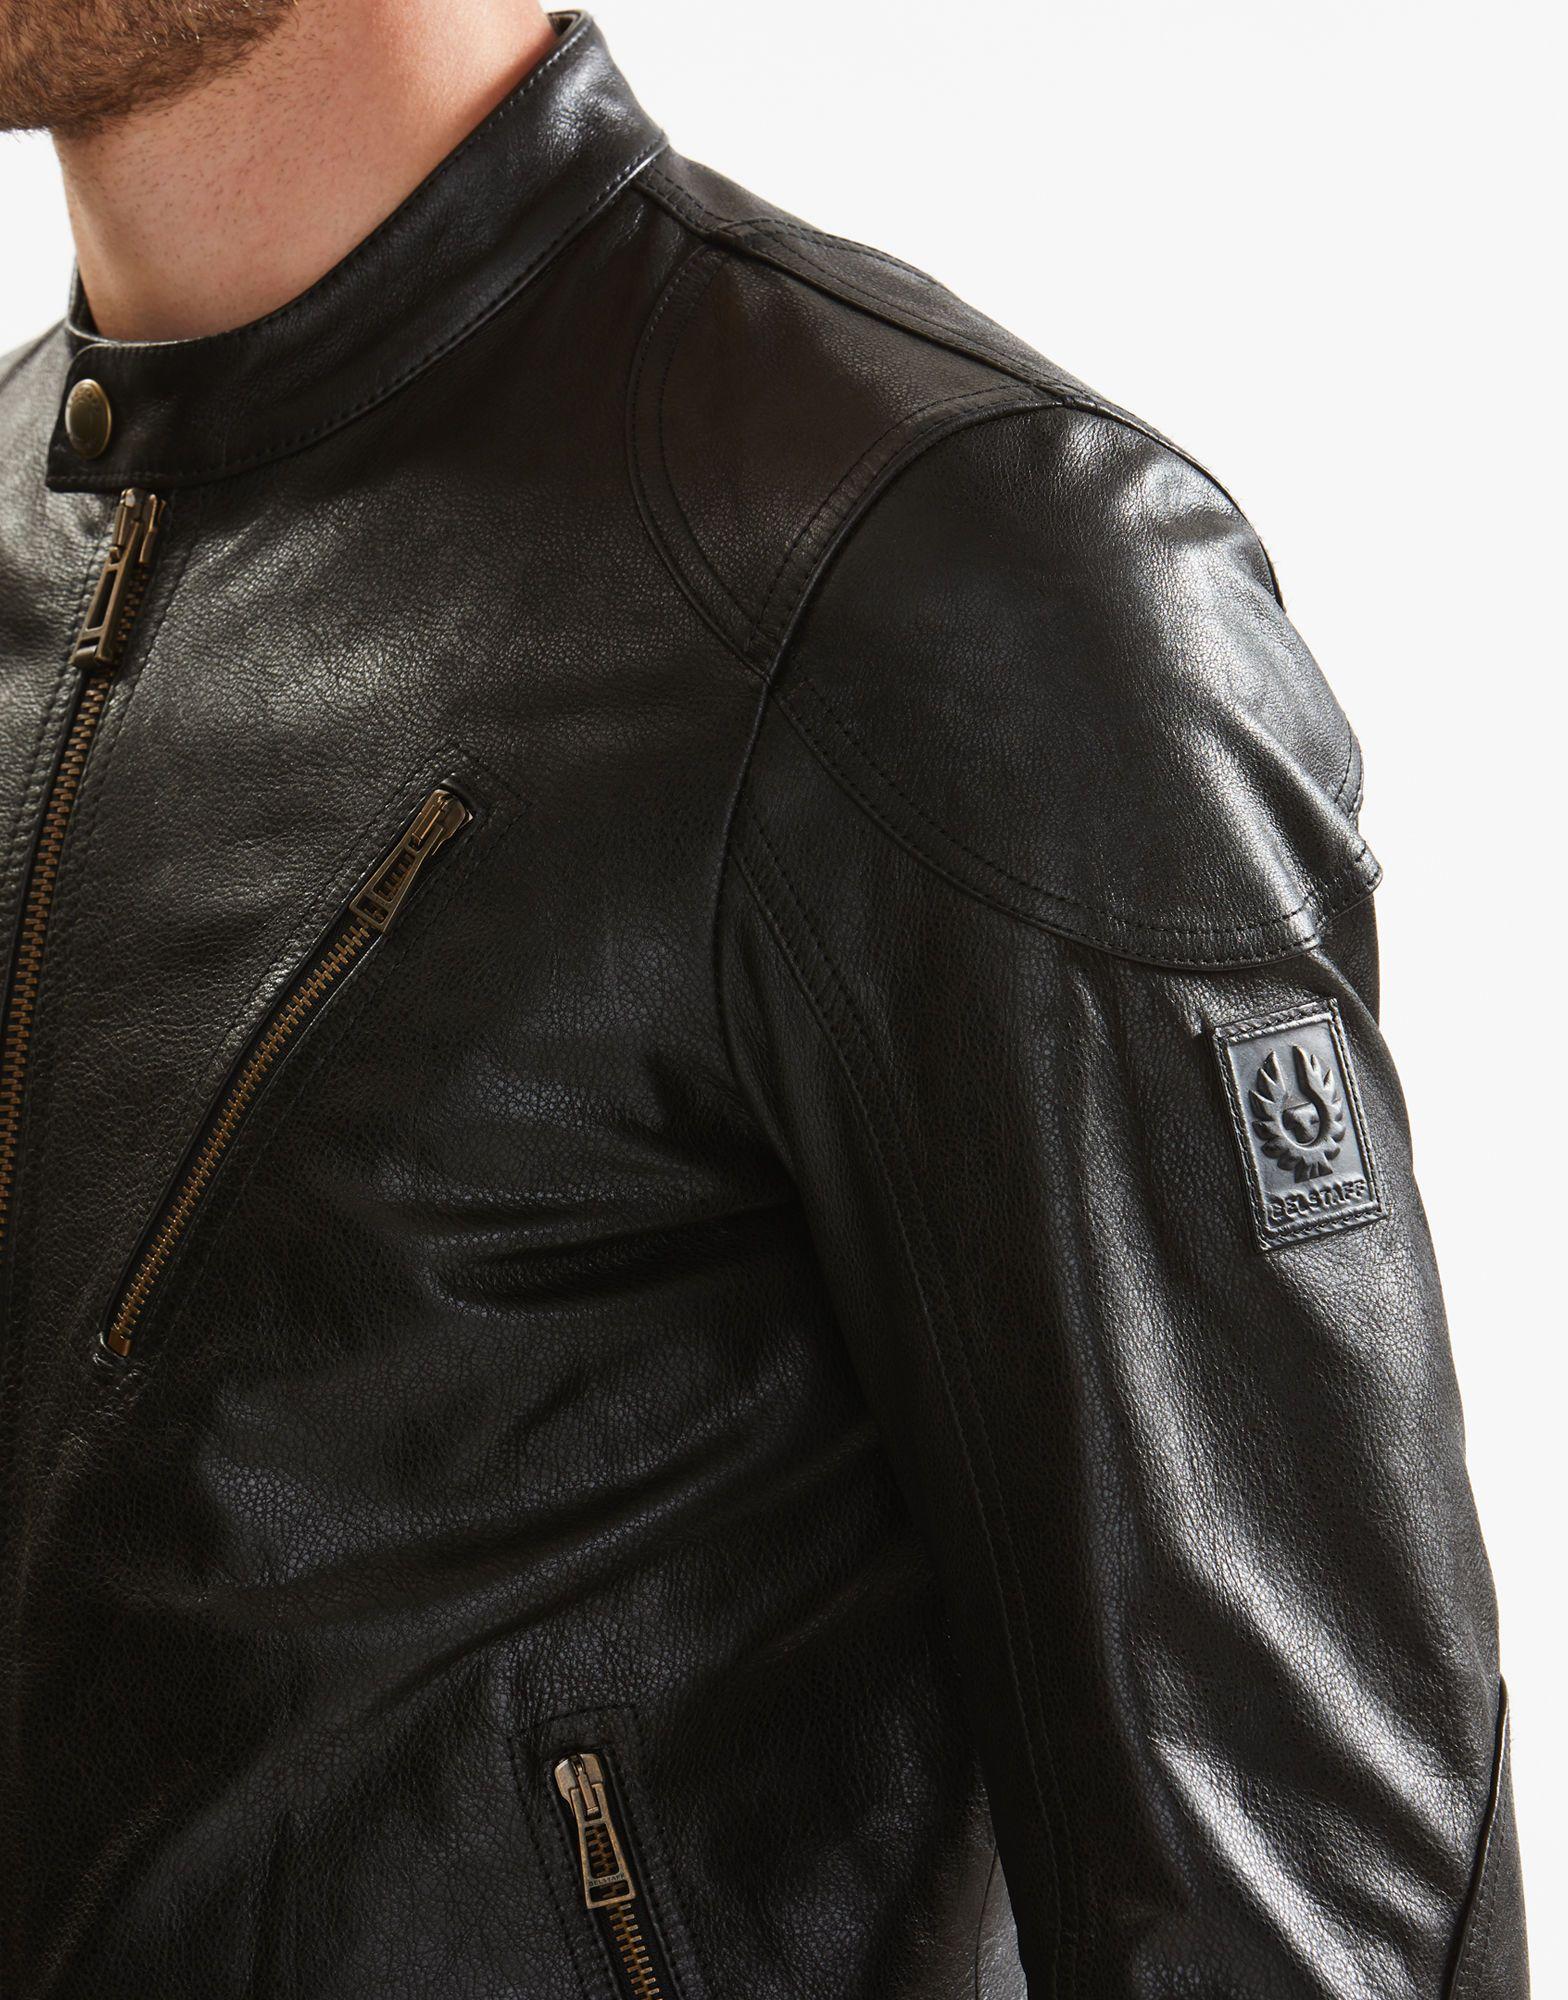 9184deb1f Maxford 2.0ブルゾンジャケット   leather jacket   Jackets, Leather ...